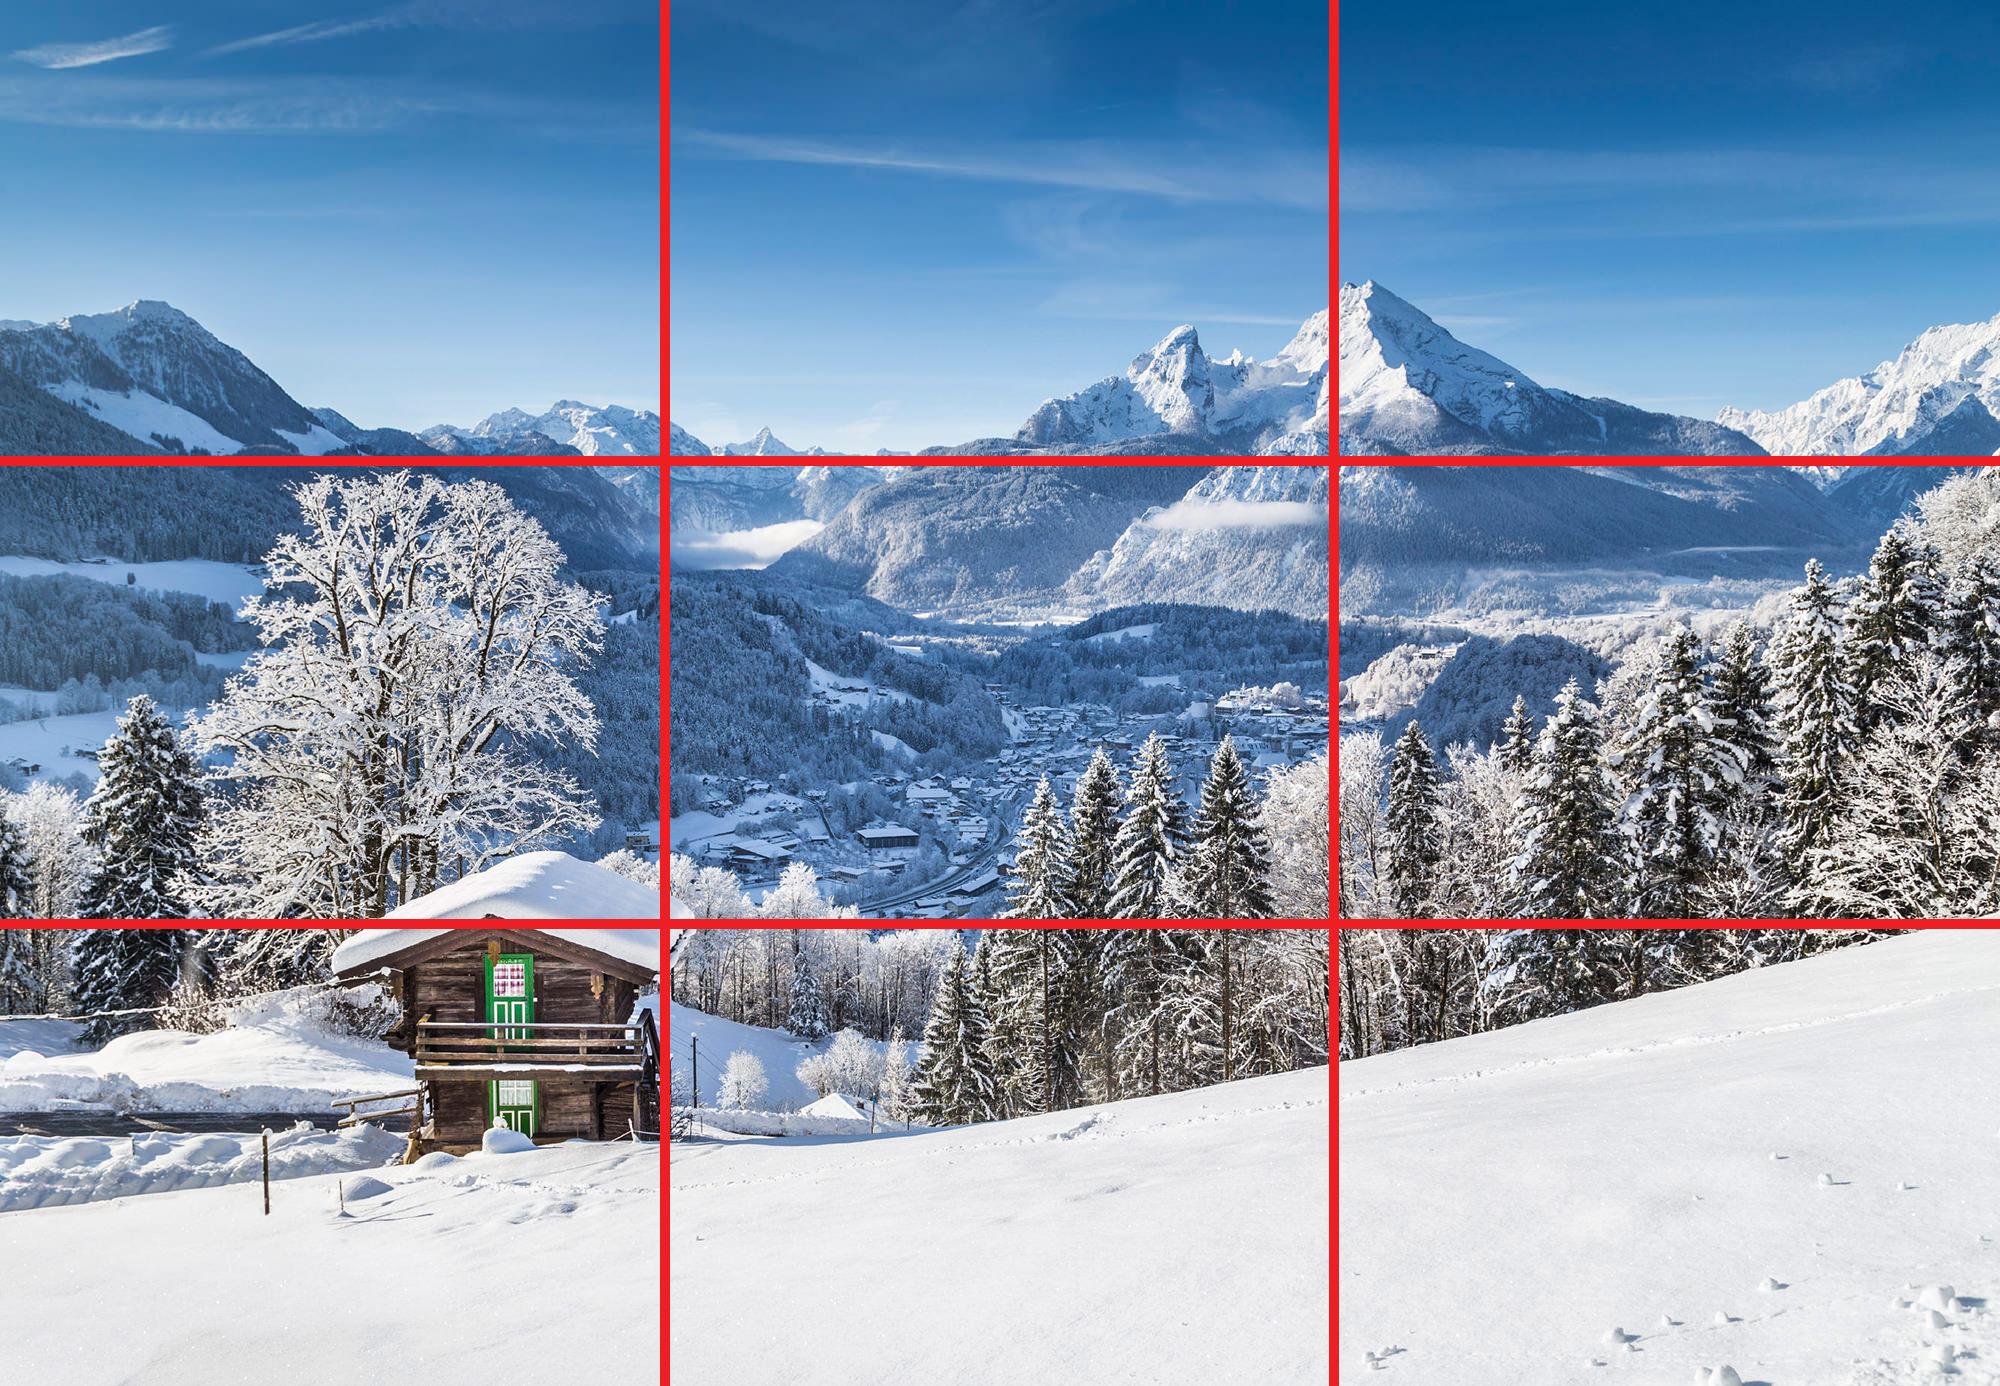 iStock 000076628991 Large2 image